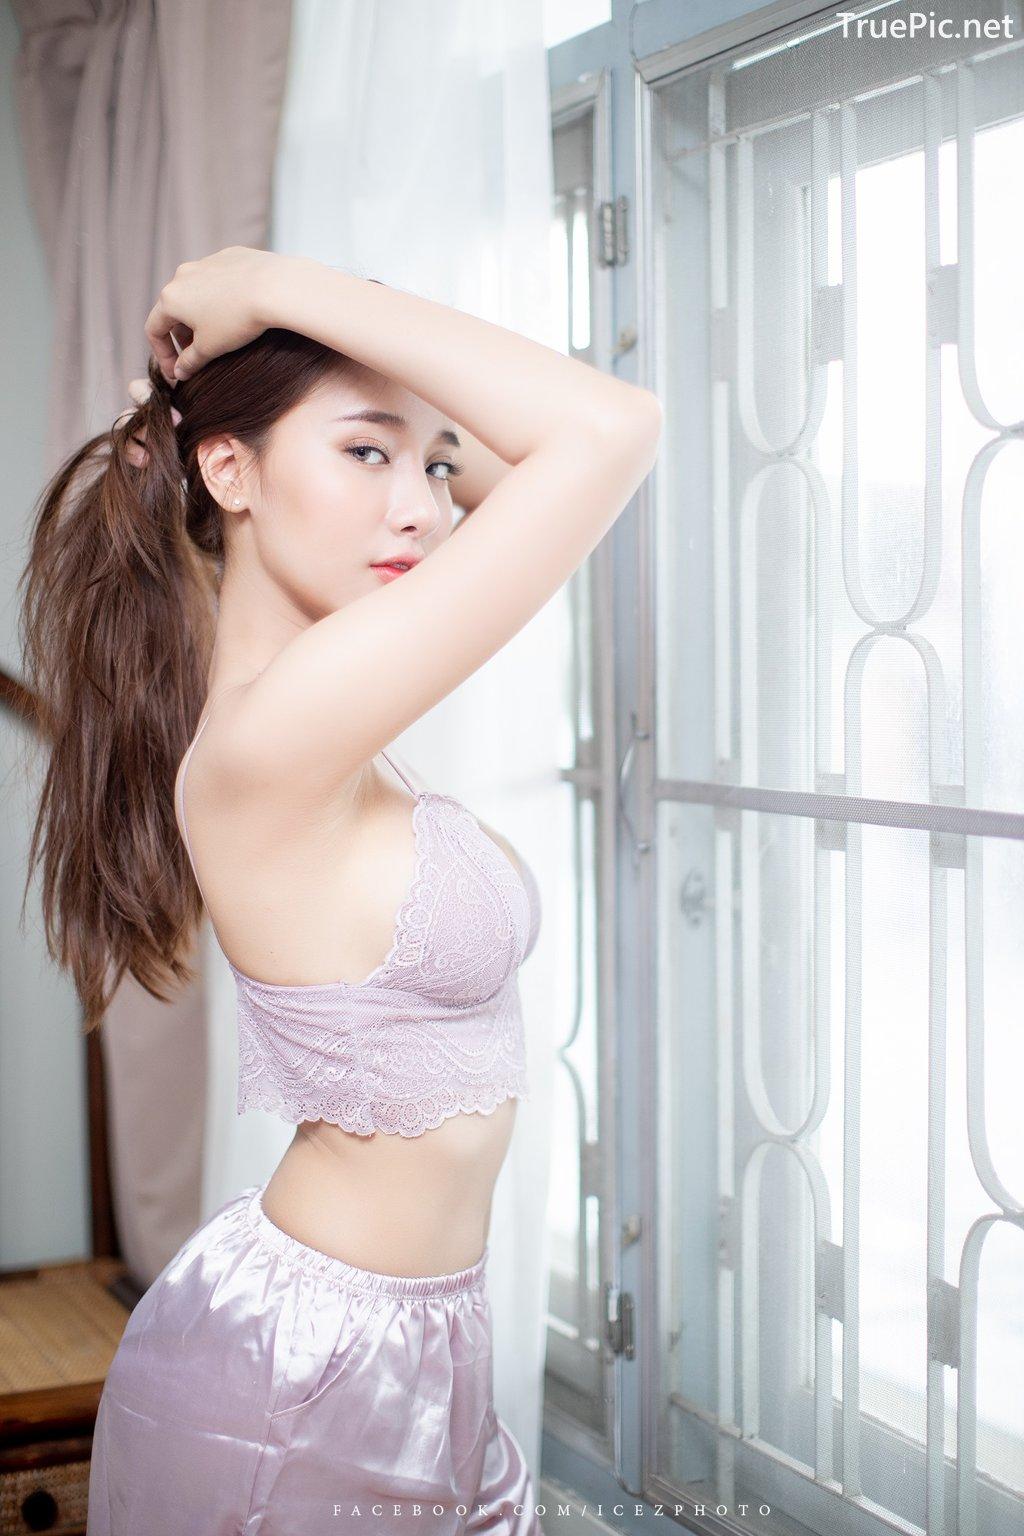 Image-Thailand-Hot-Model-Pichana-Yoosuk-Sexy-Purple-Bra-Shiny-Short-Pants-TruePic.net- Picture-8